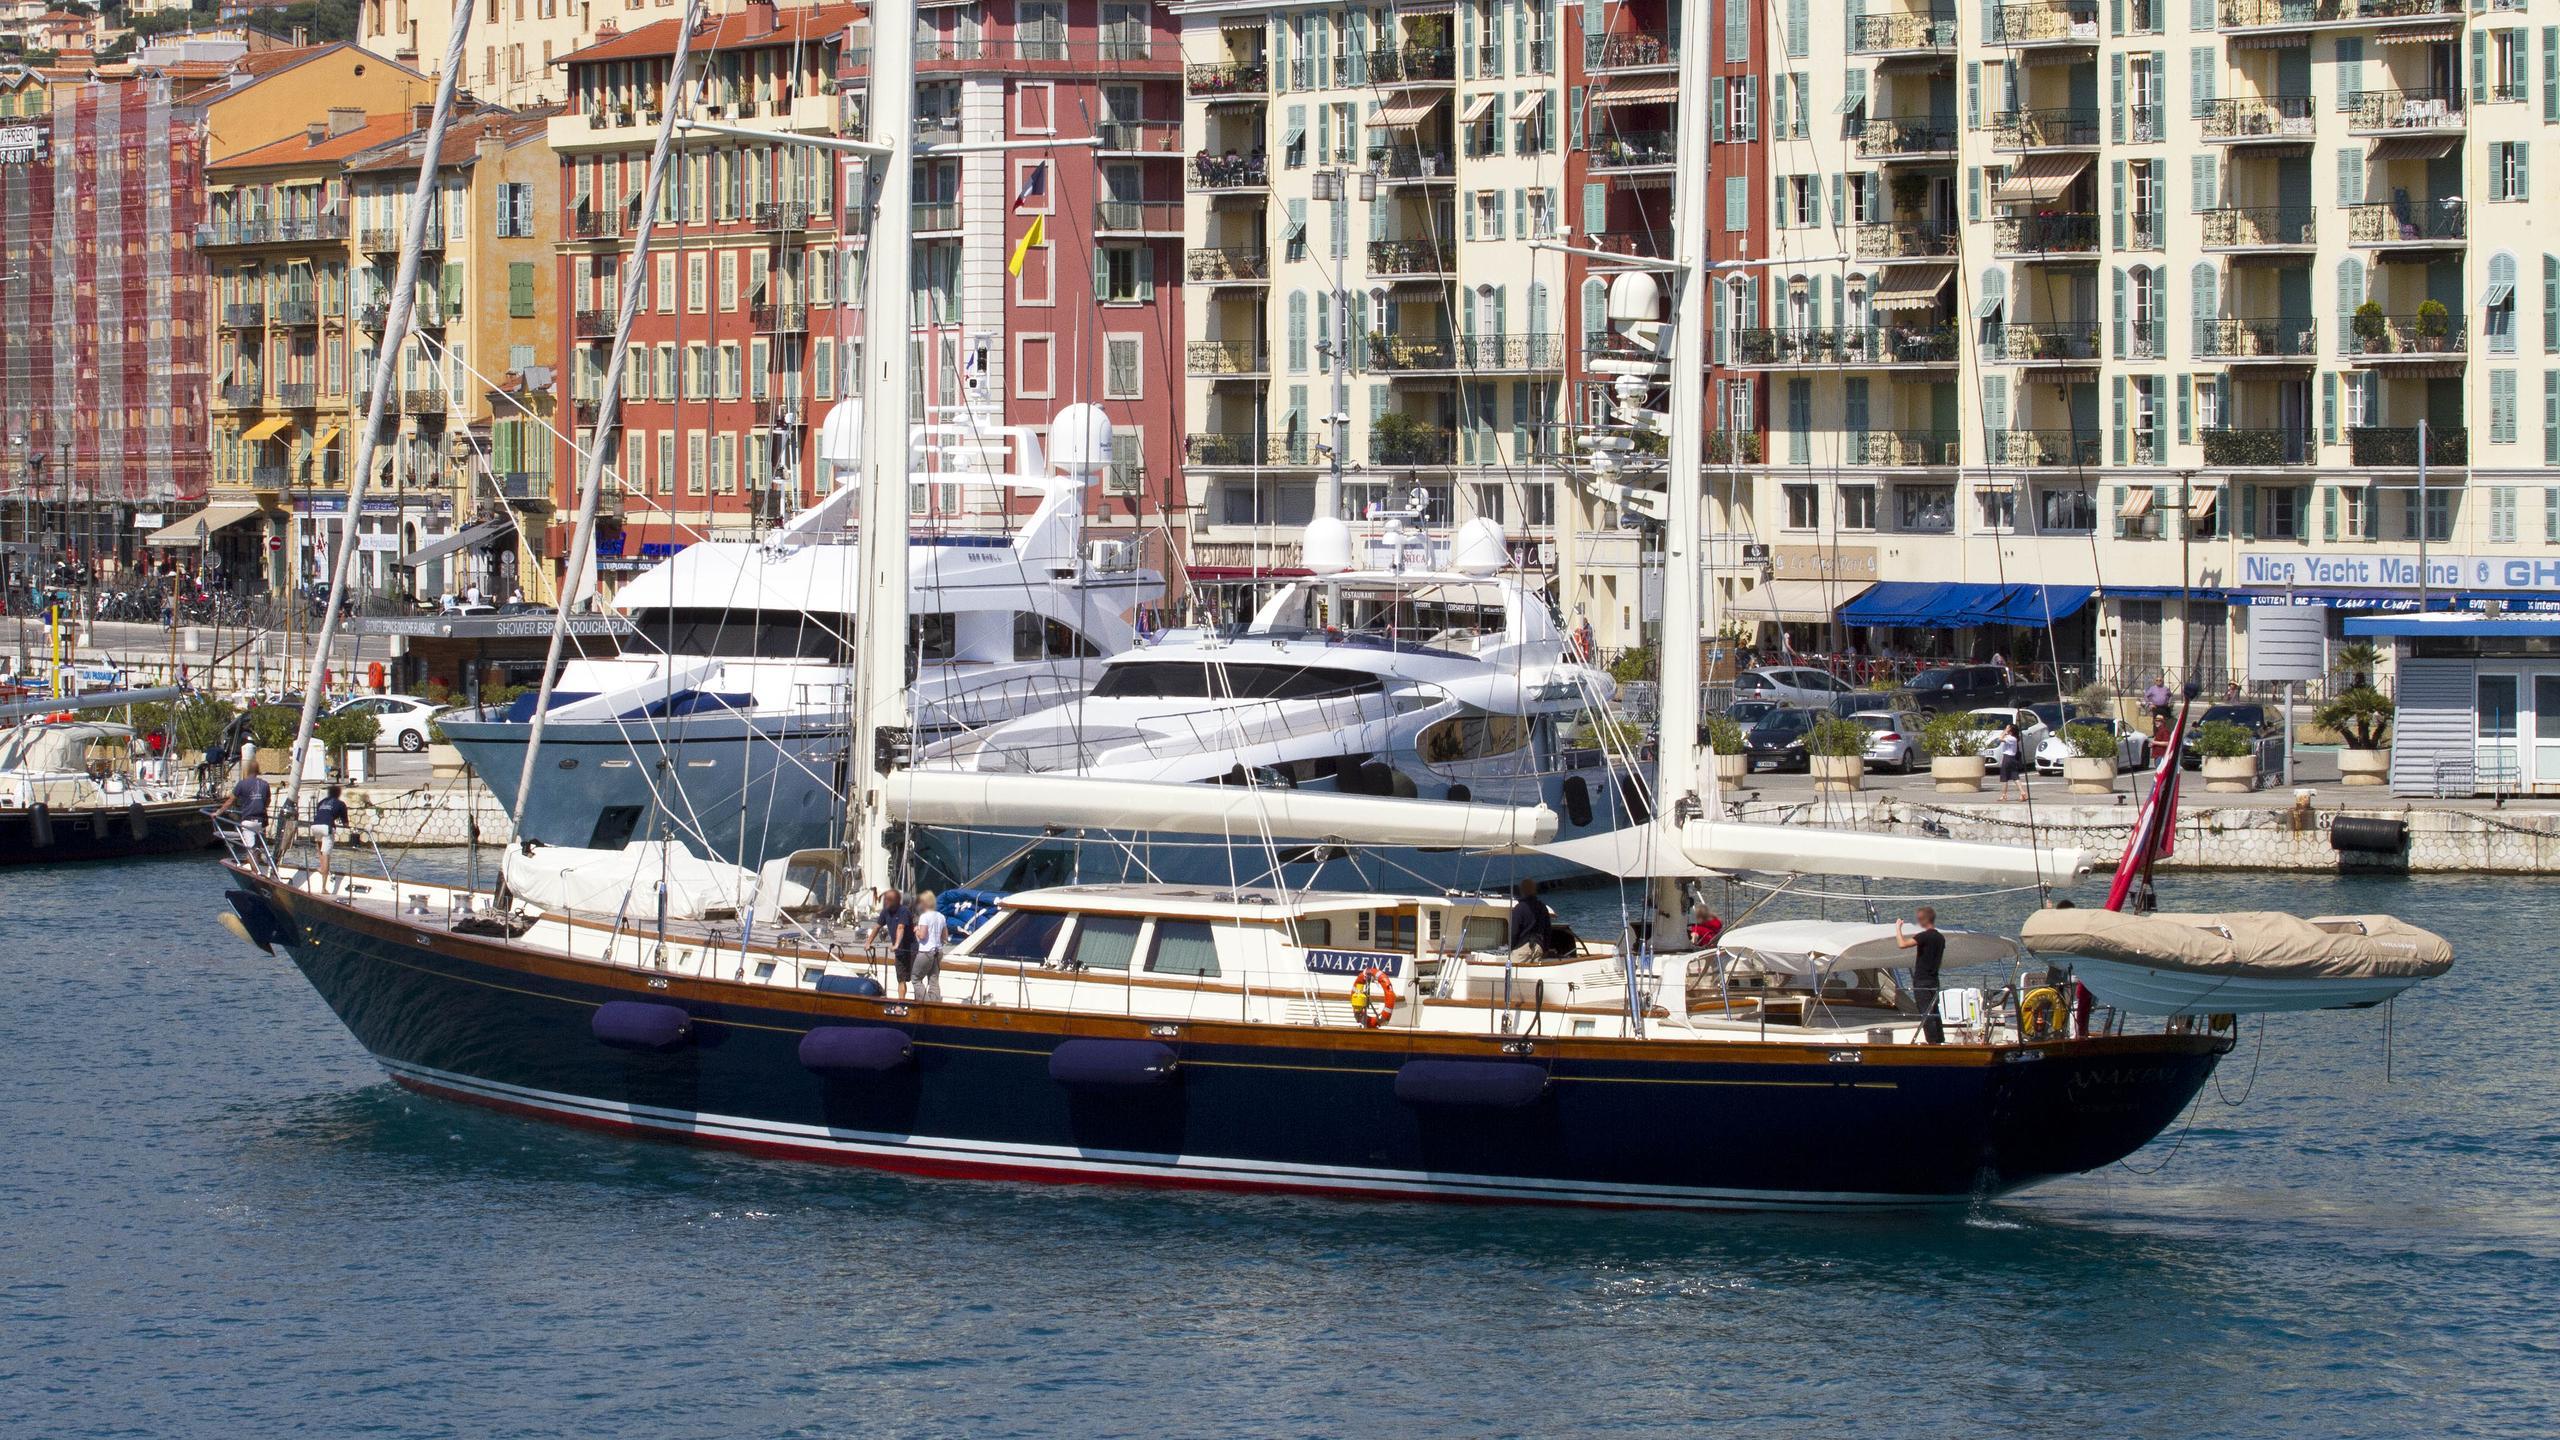 anakena-sailing-yacht-royal-huisman-1996-40m-running-half-profile